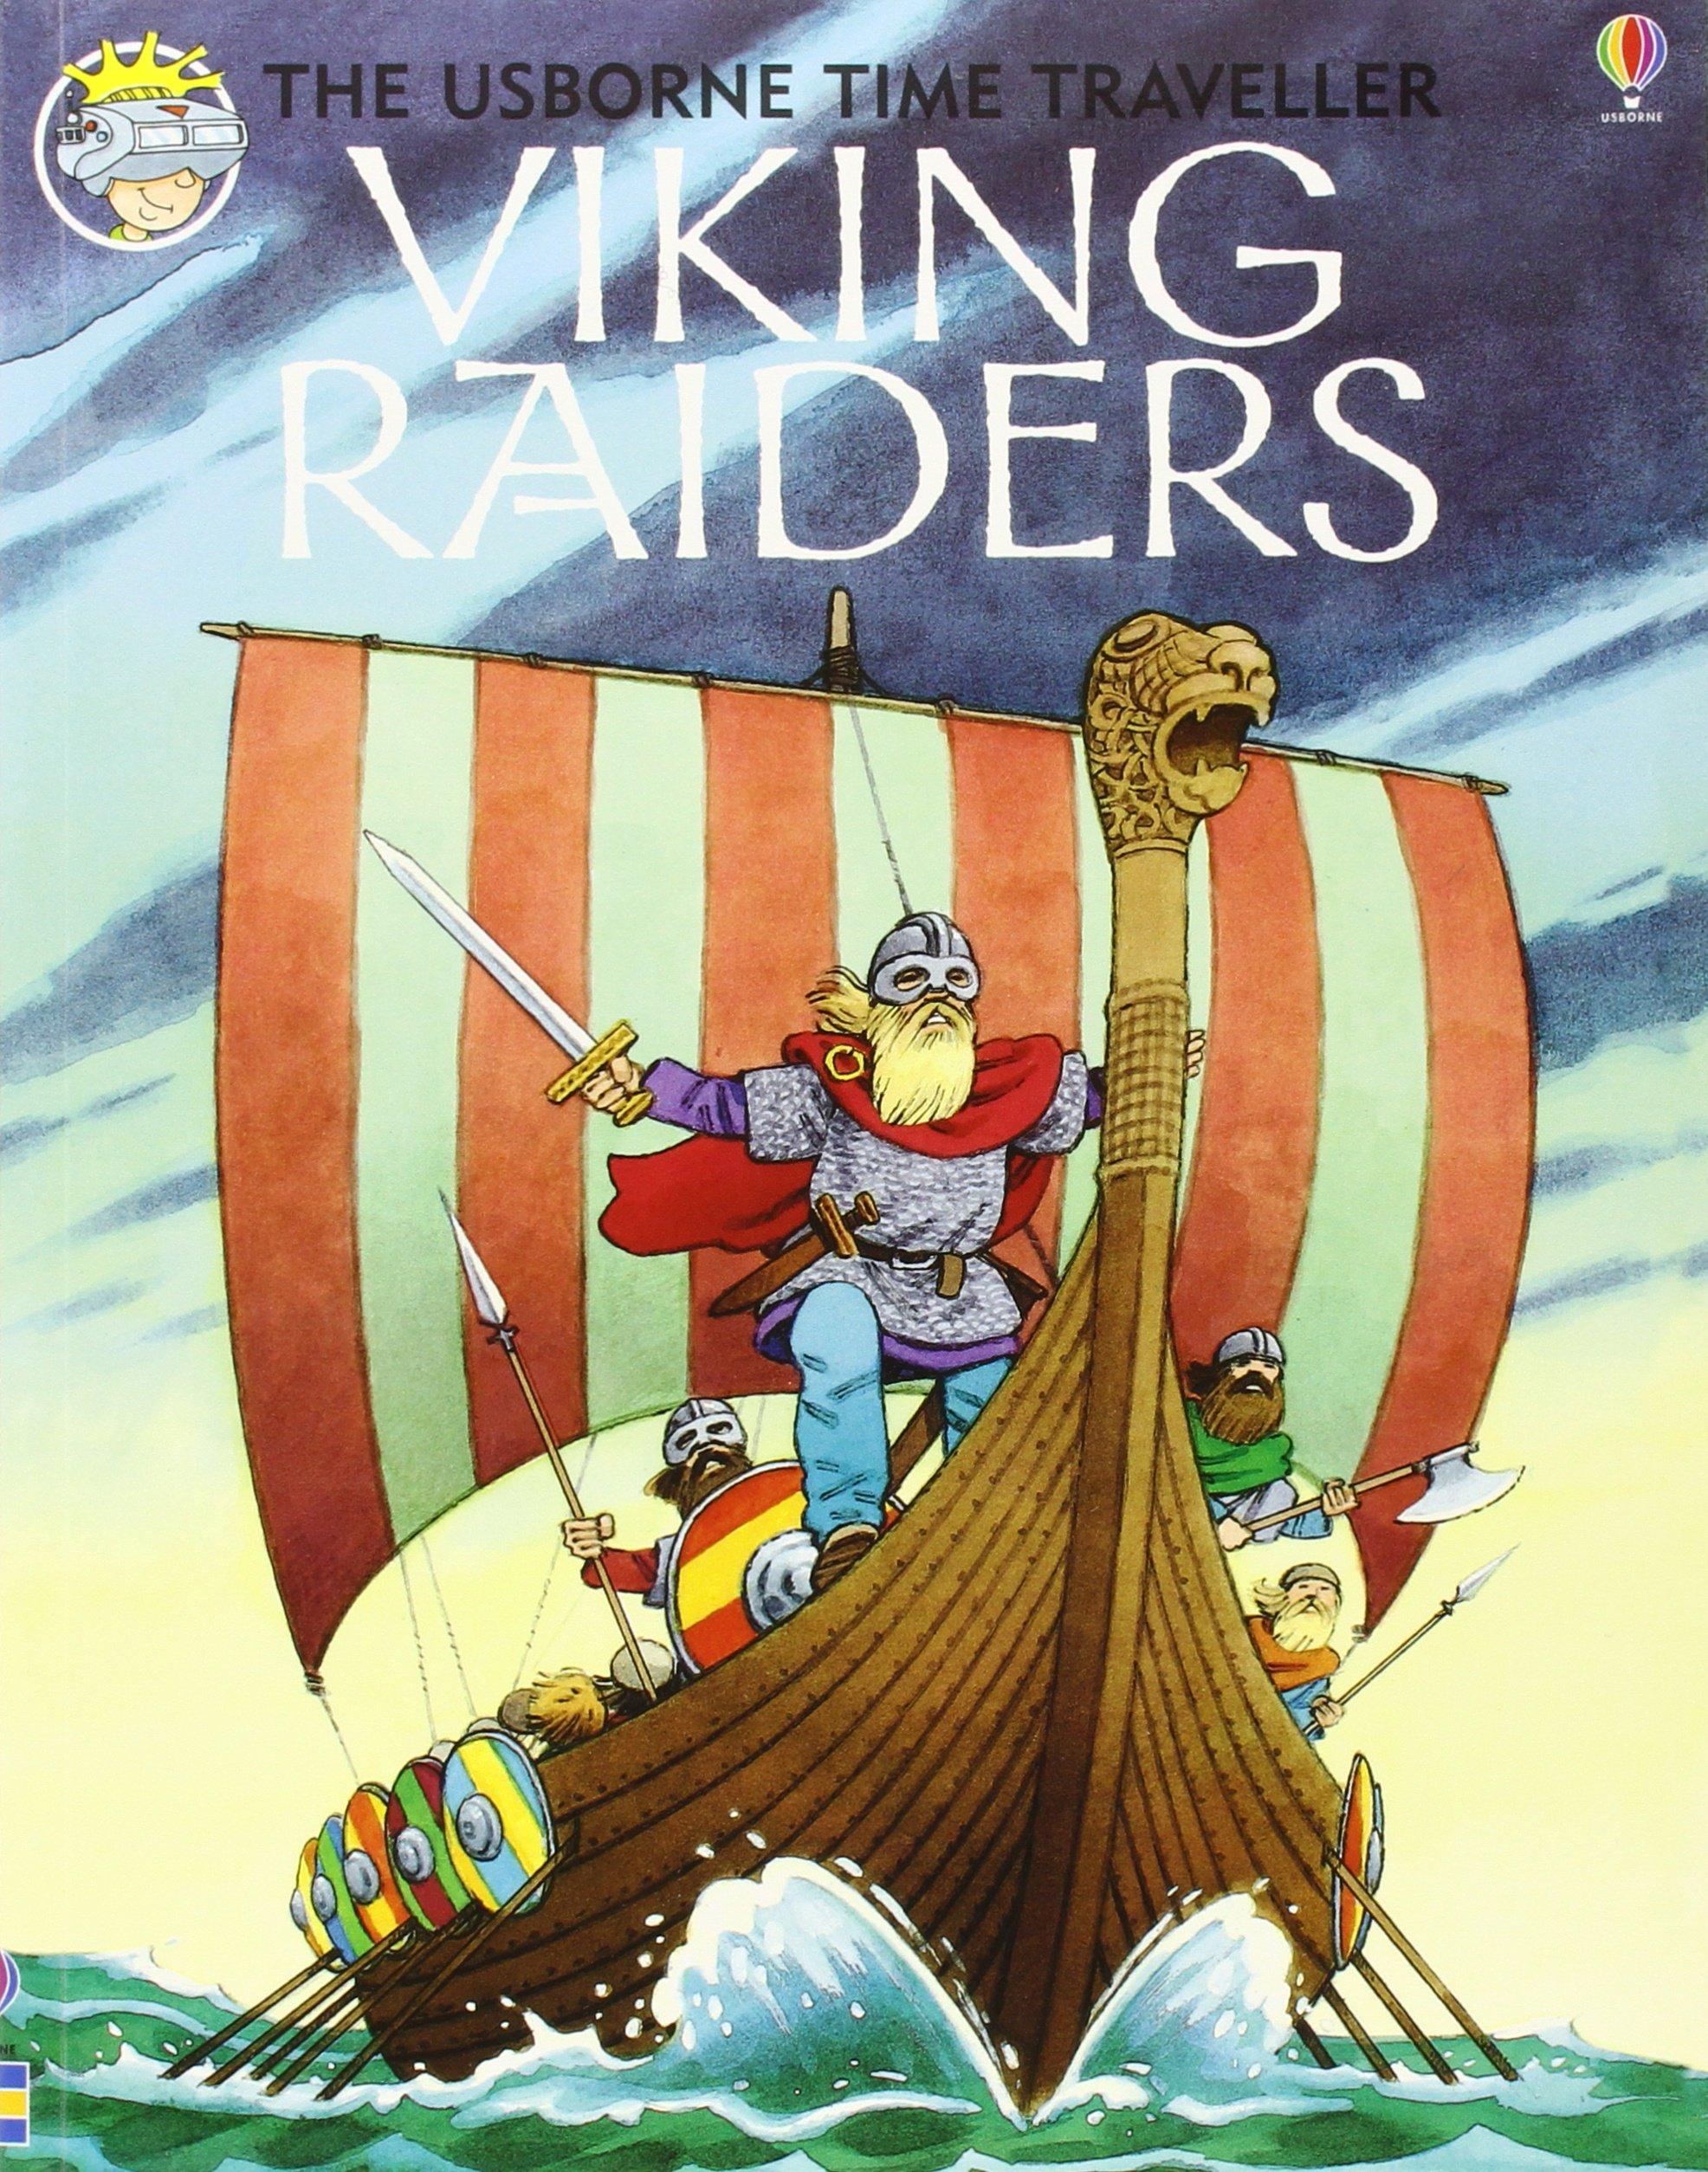 Viking Raiders (Usborne Time Traveler)